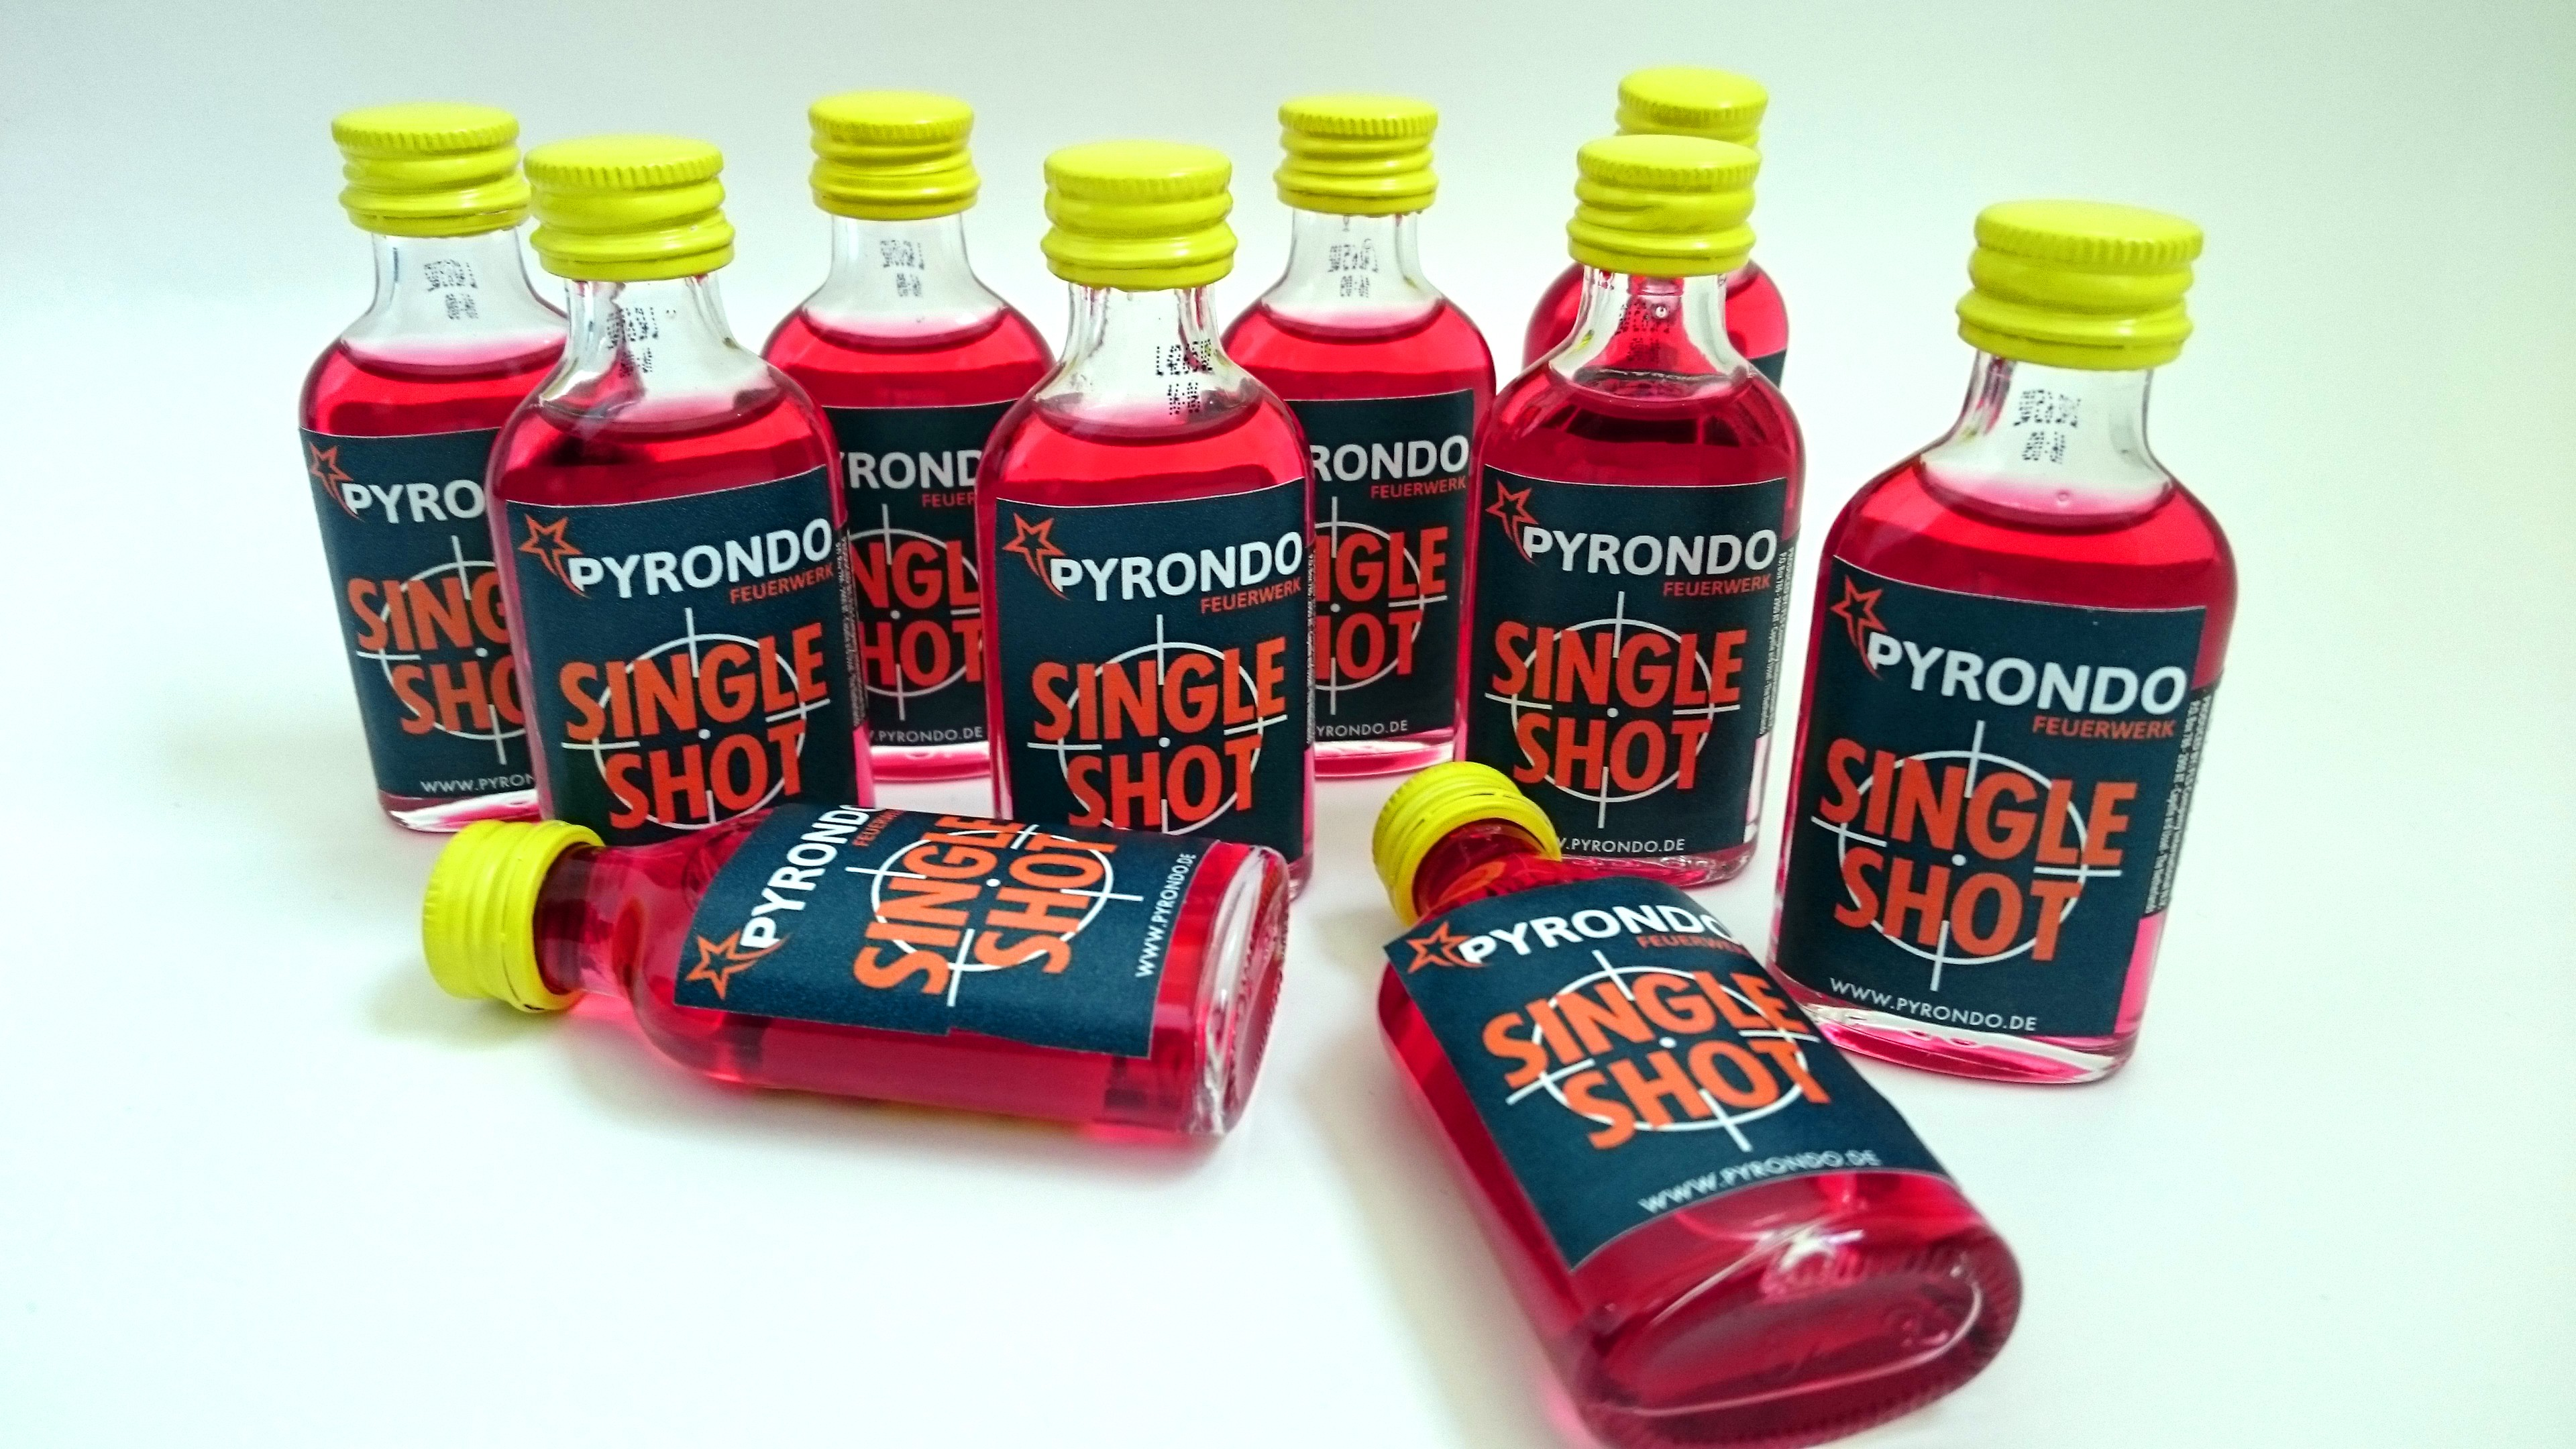 Pyrondo Single Shot